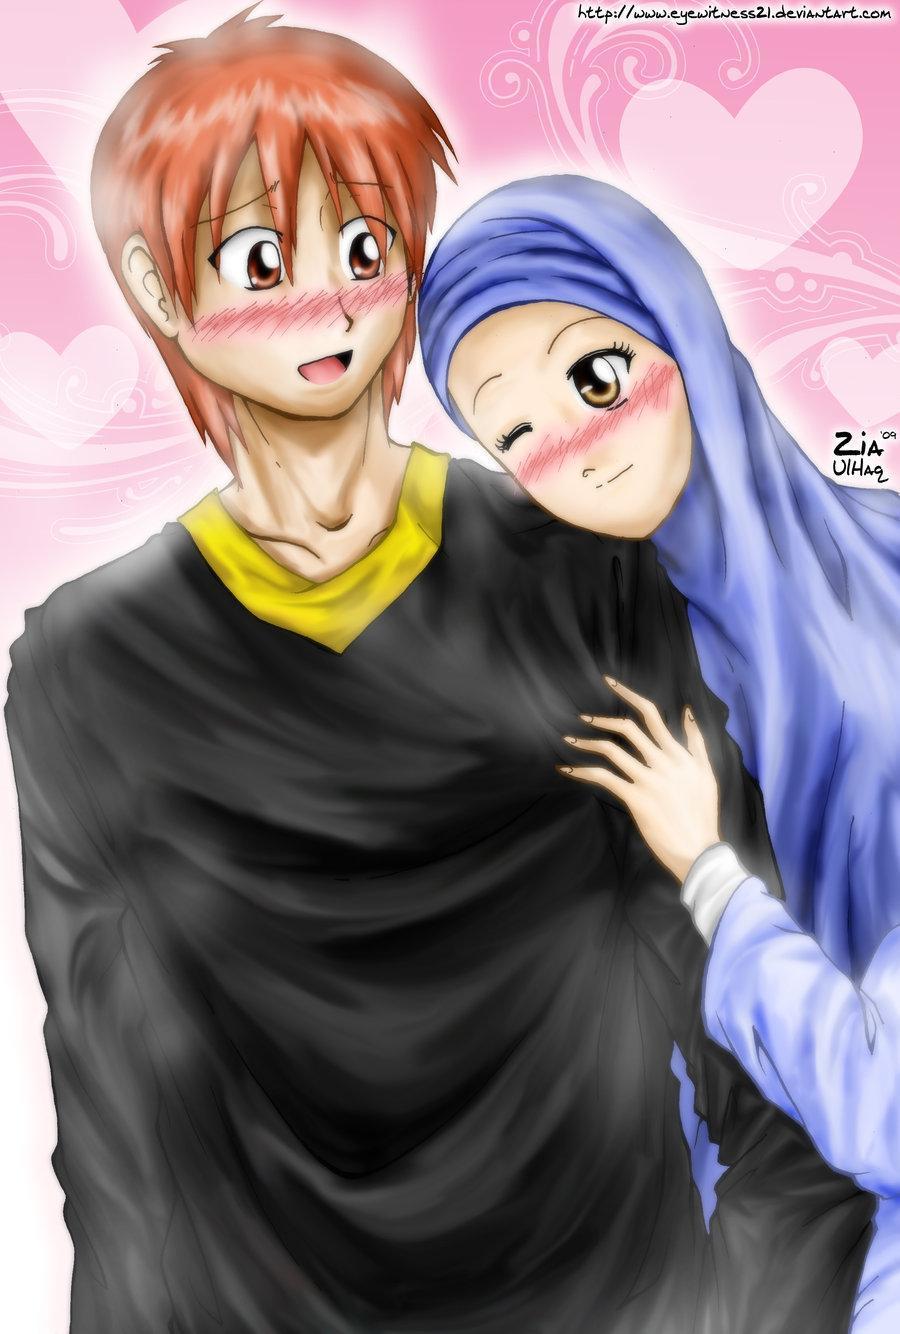 Muslim couple cartoon wallpaper screenshot 3